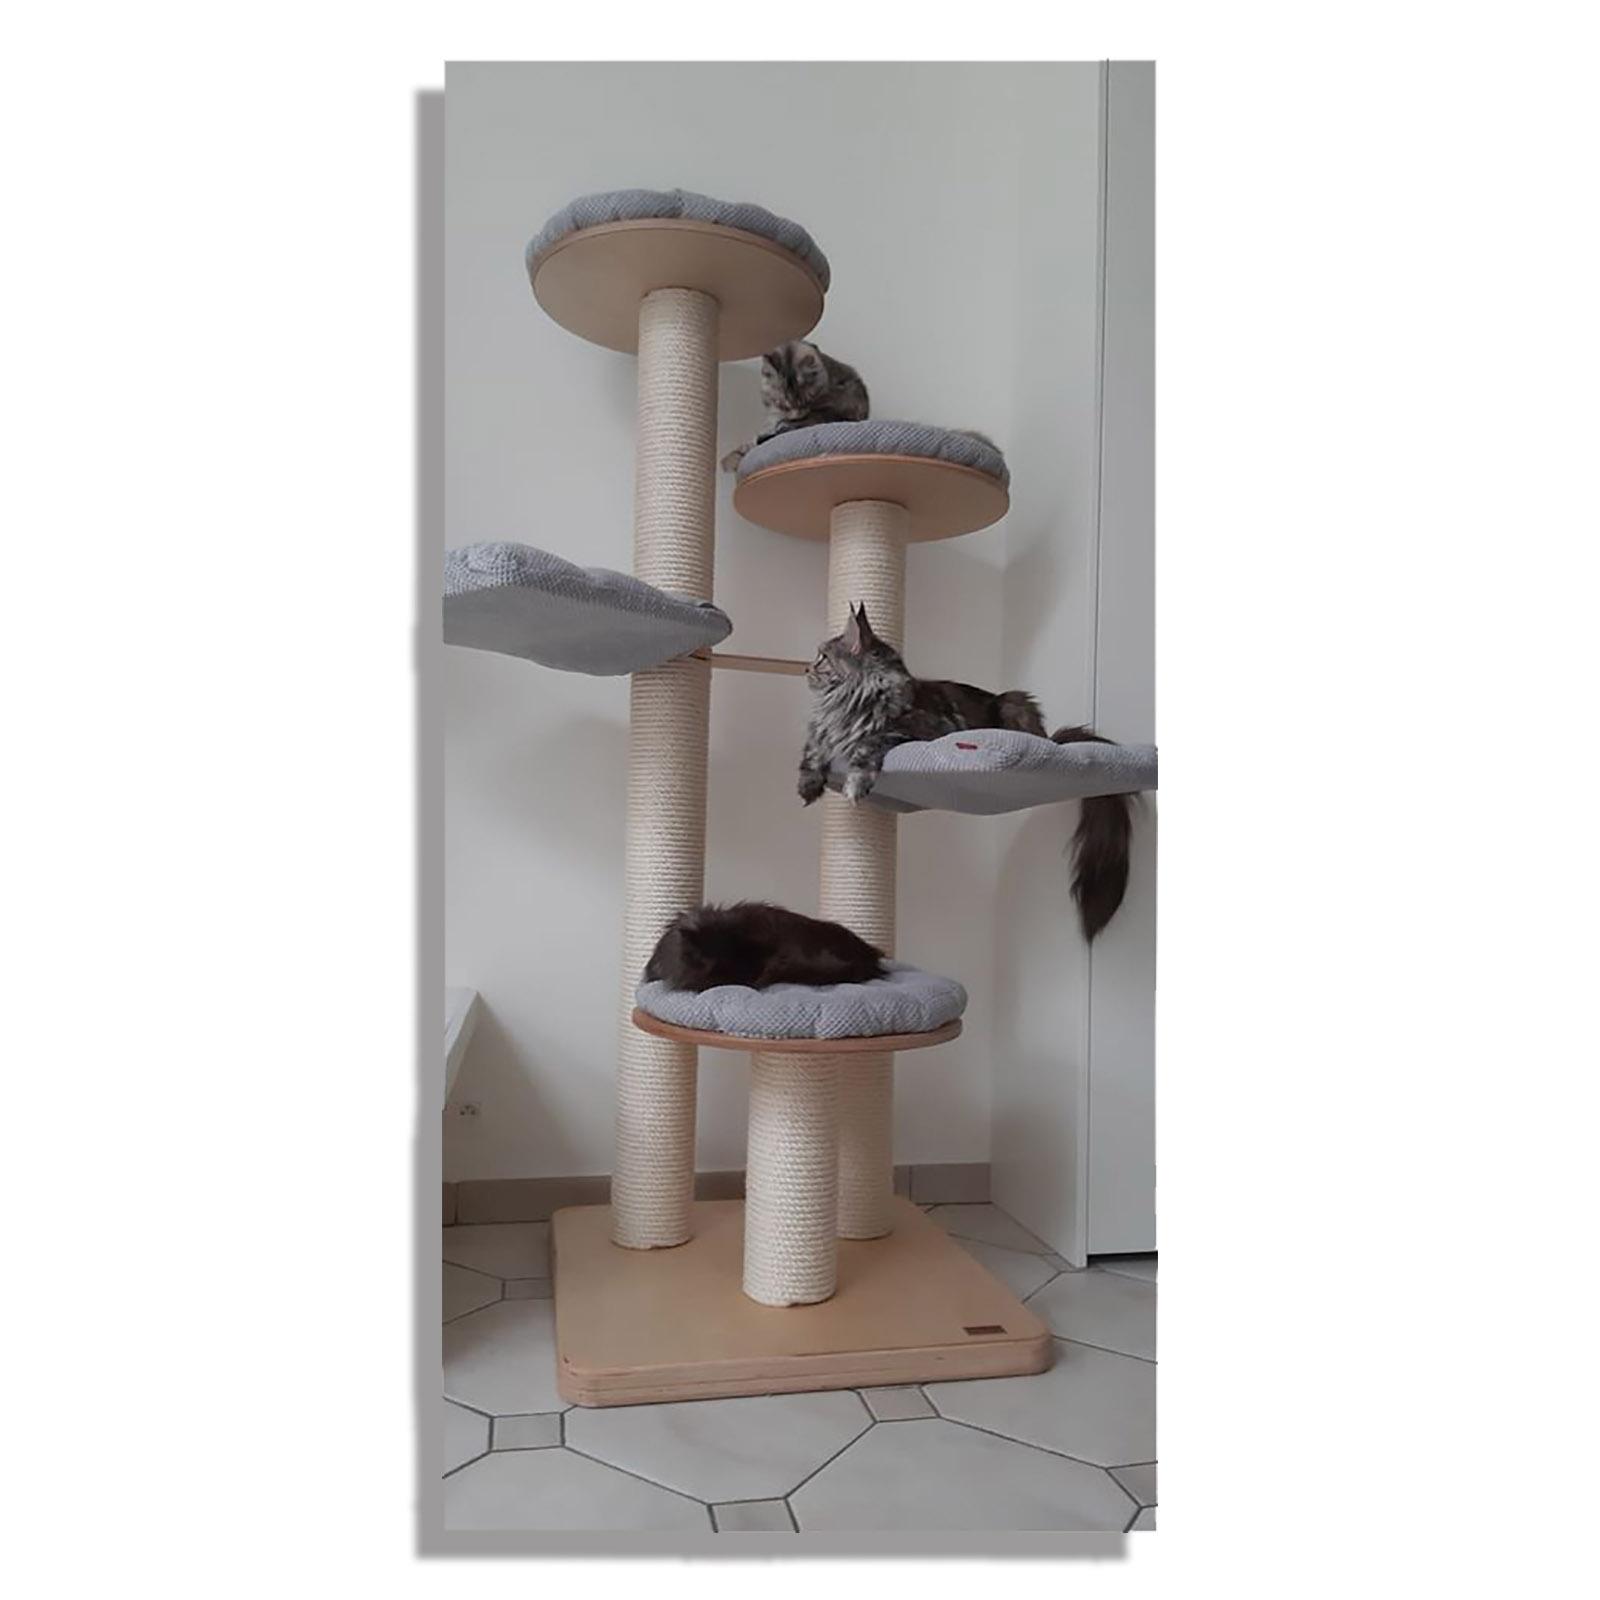 tiragraffi per gatti EX-7